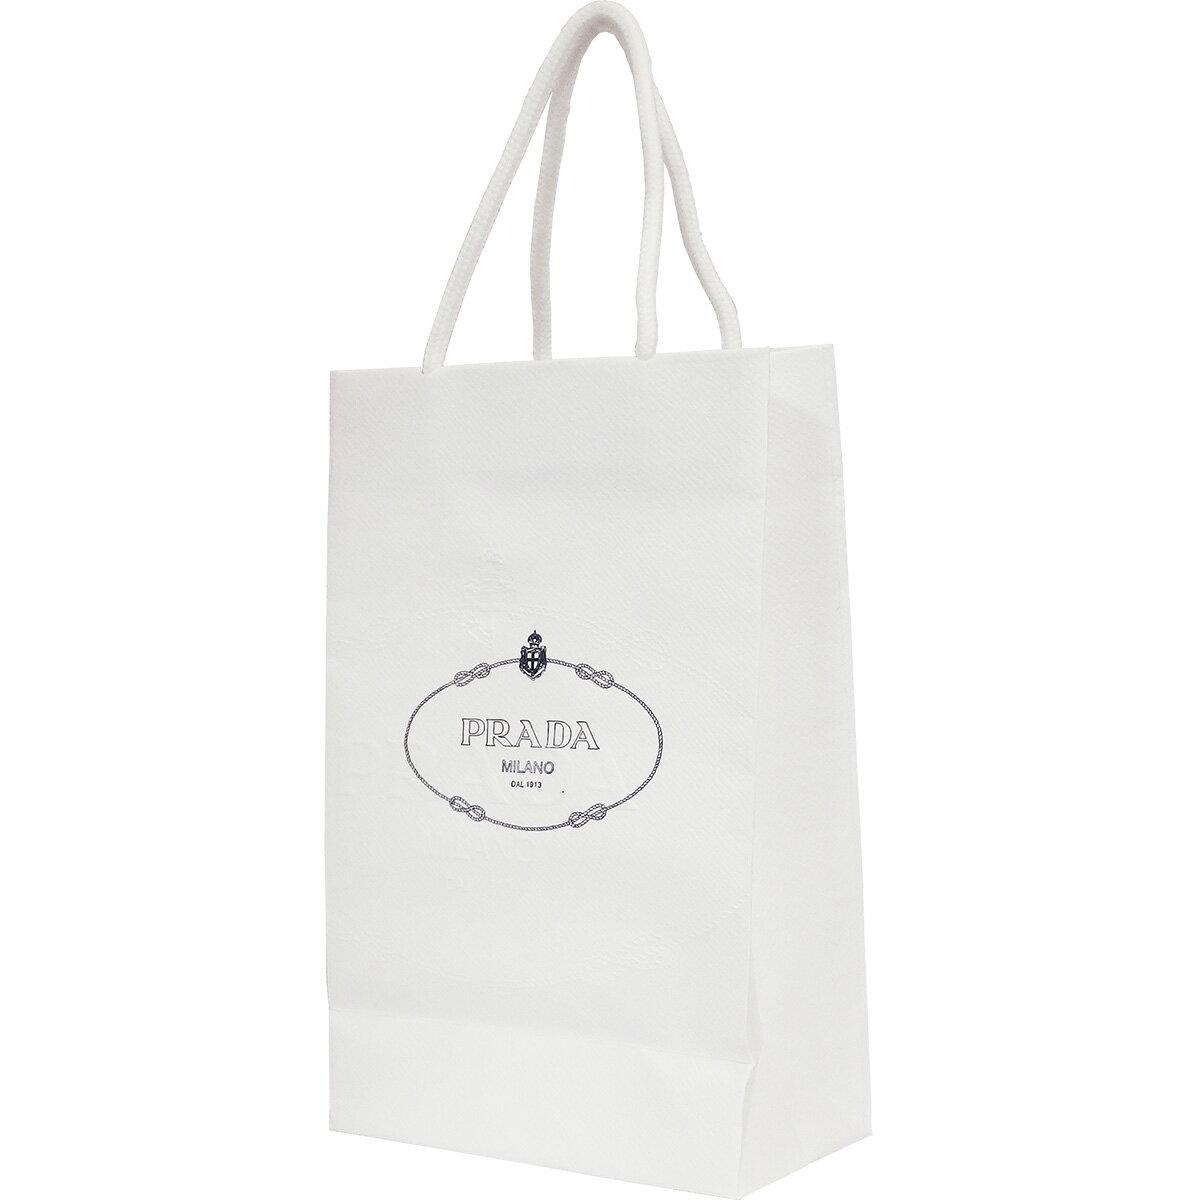 袋, 紙袋・手提げ袋  PRADA 1 A 10 20 30 40 50 60